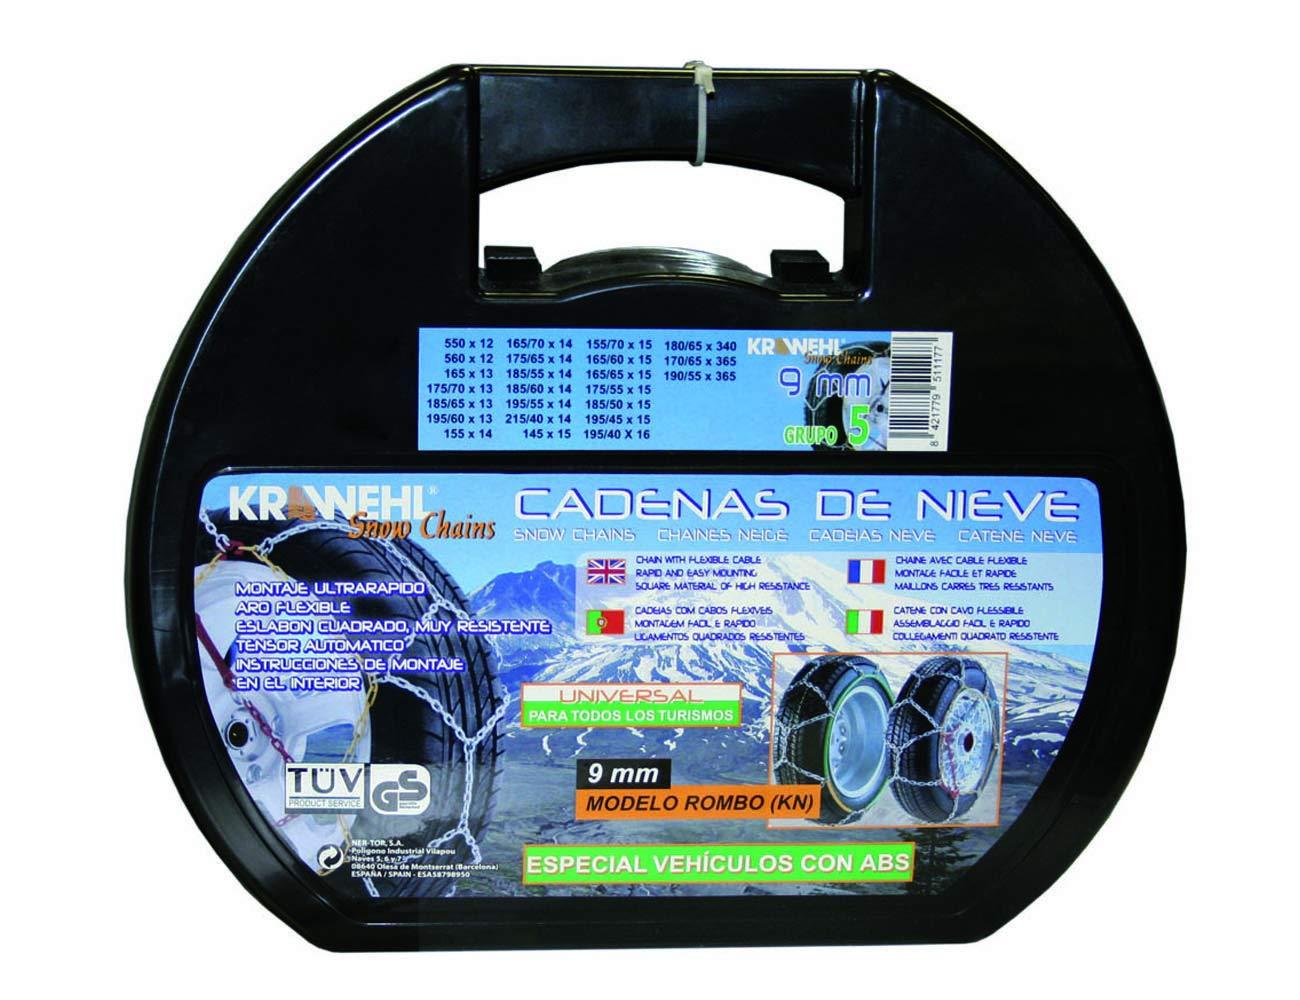 Cadenas de Nieve Tipo Rombo Universal - KRAWEHL - Ø 9mm - con ...